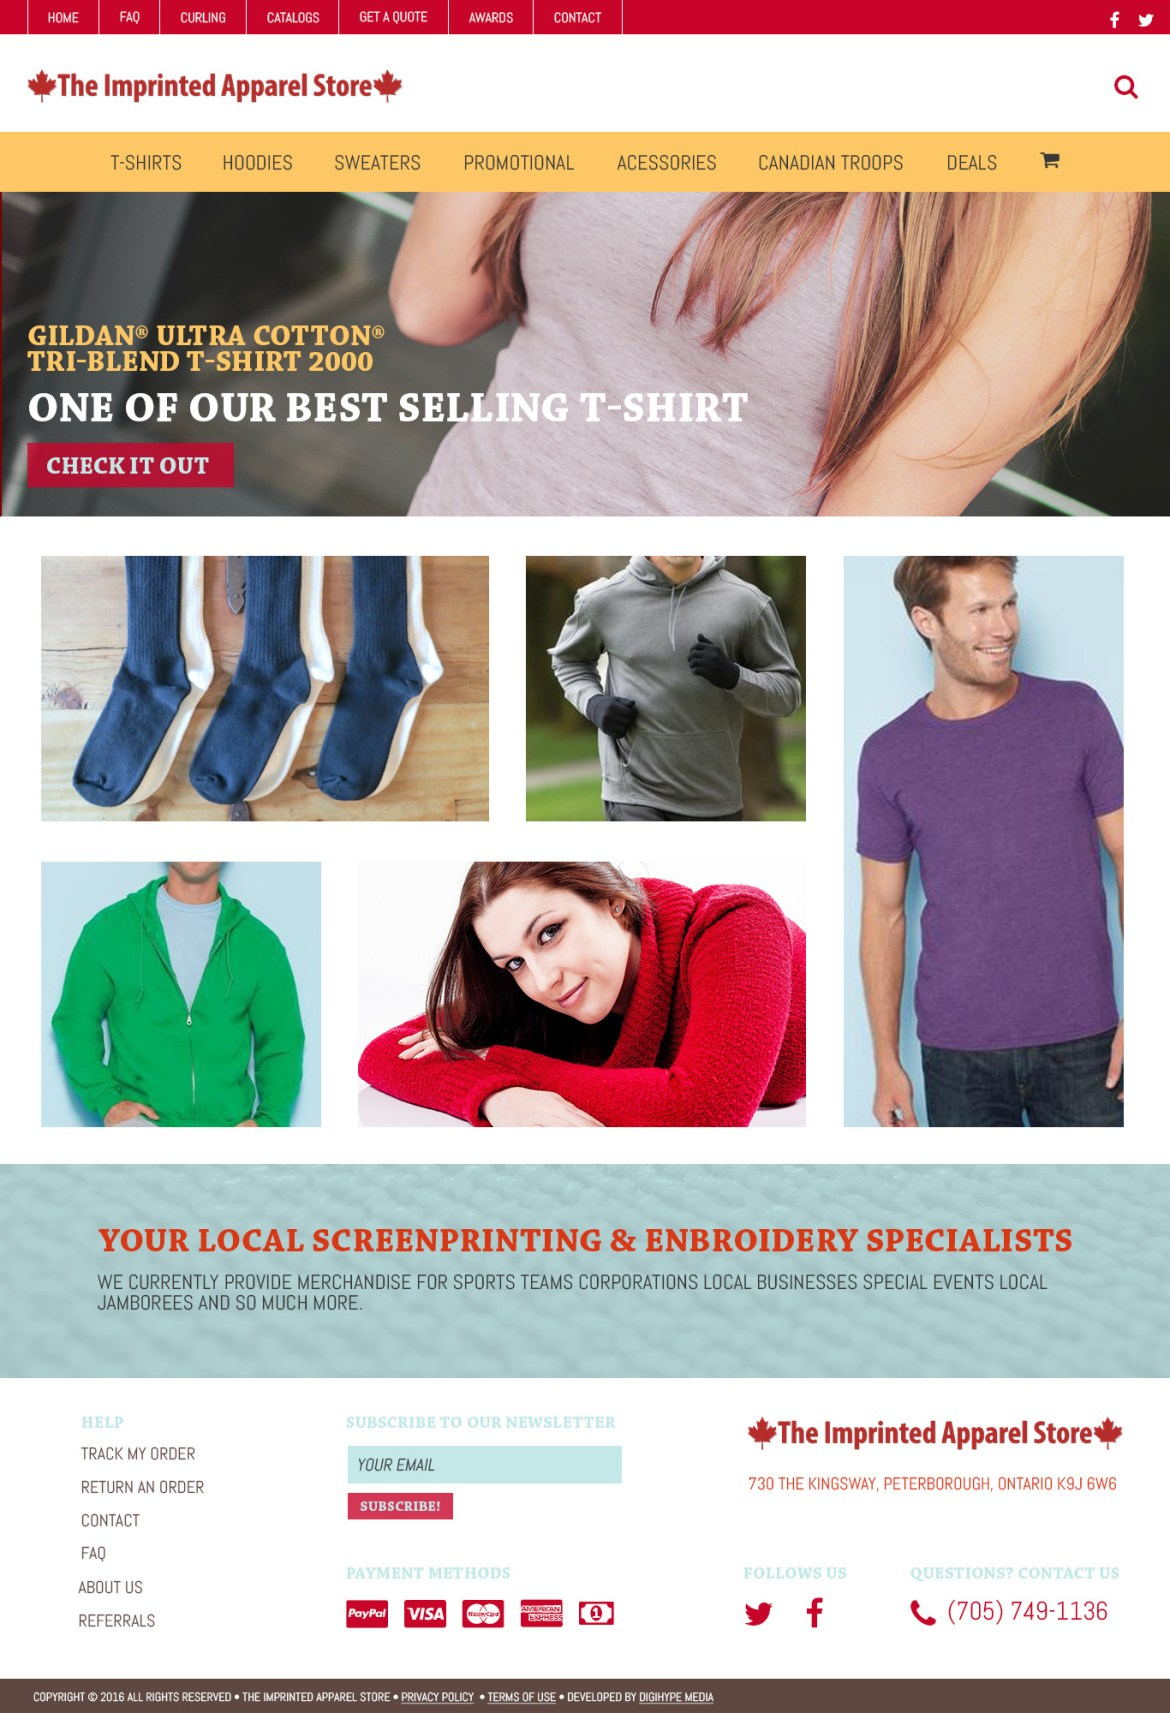 apparel e-commerce shop website design